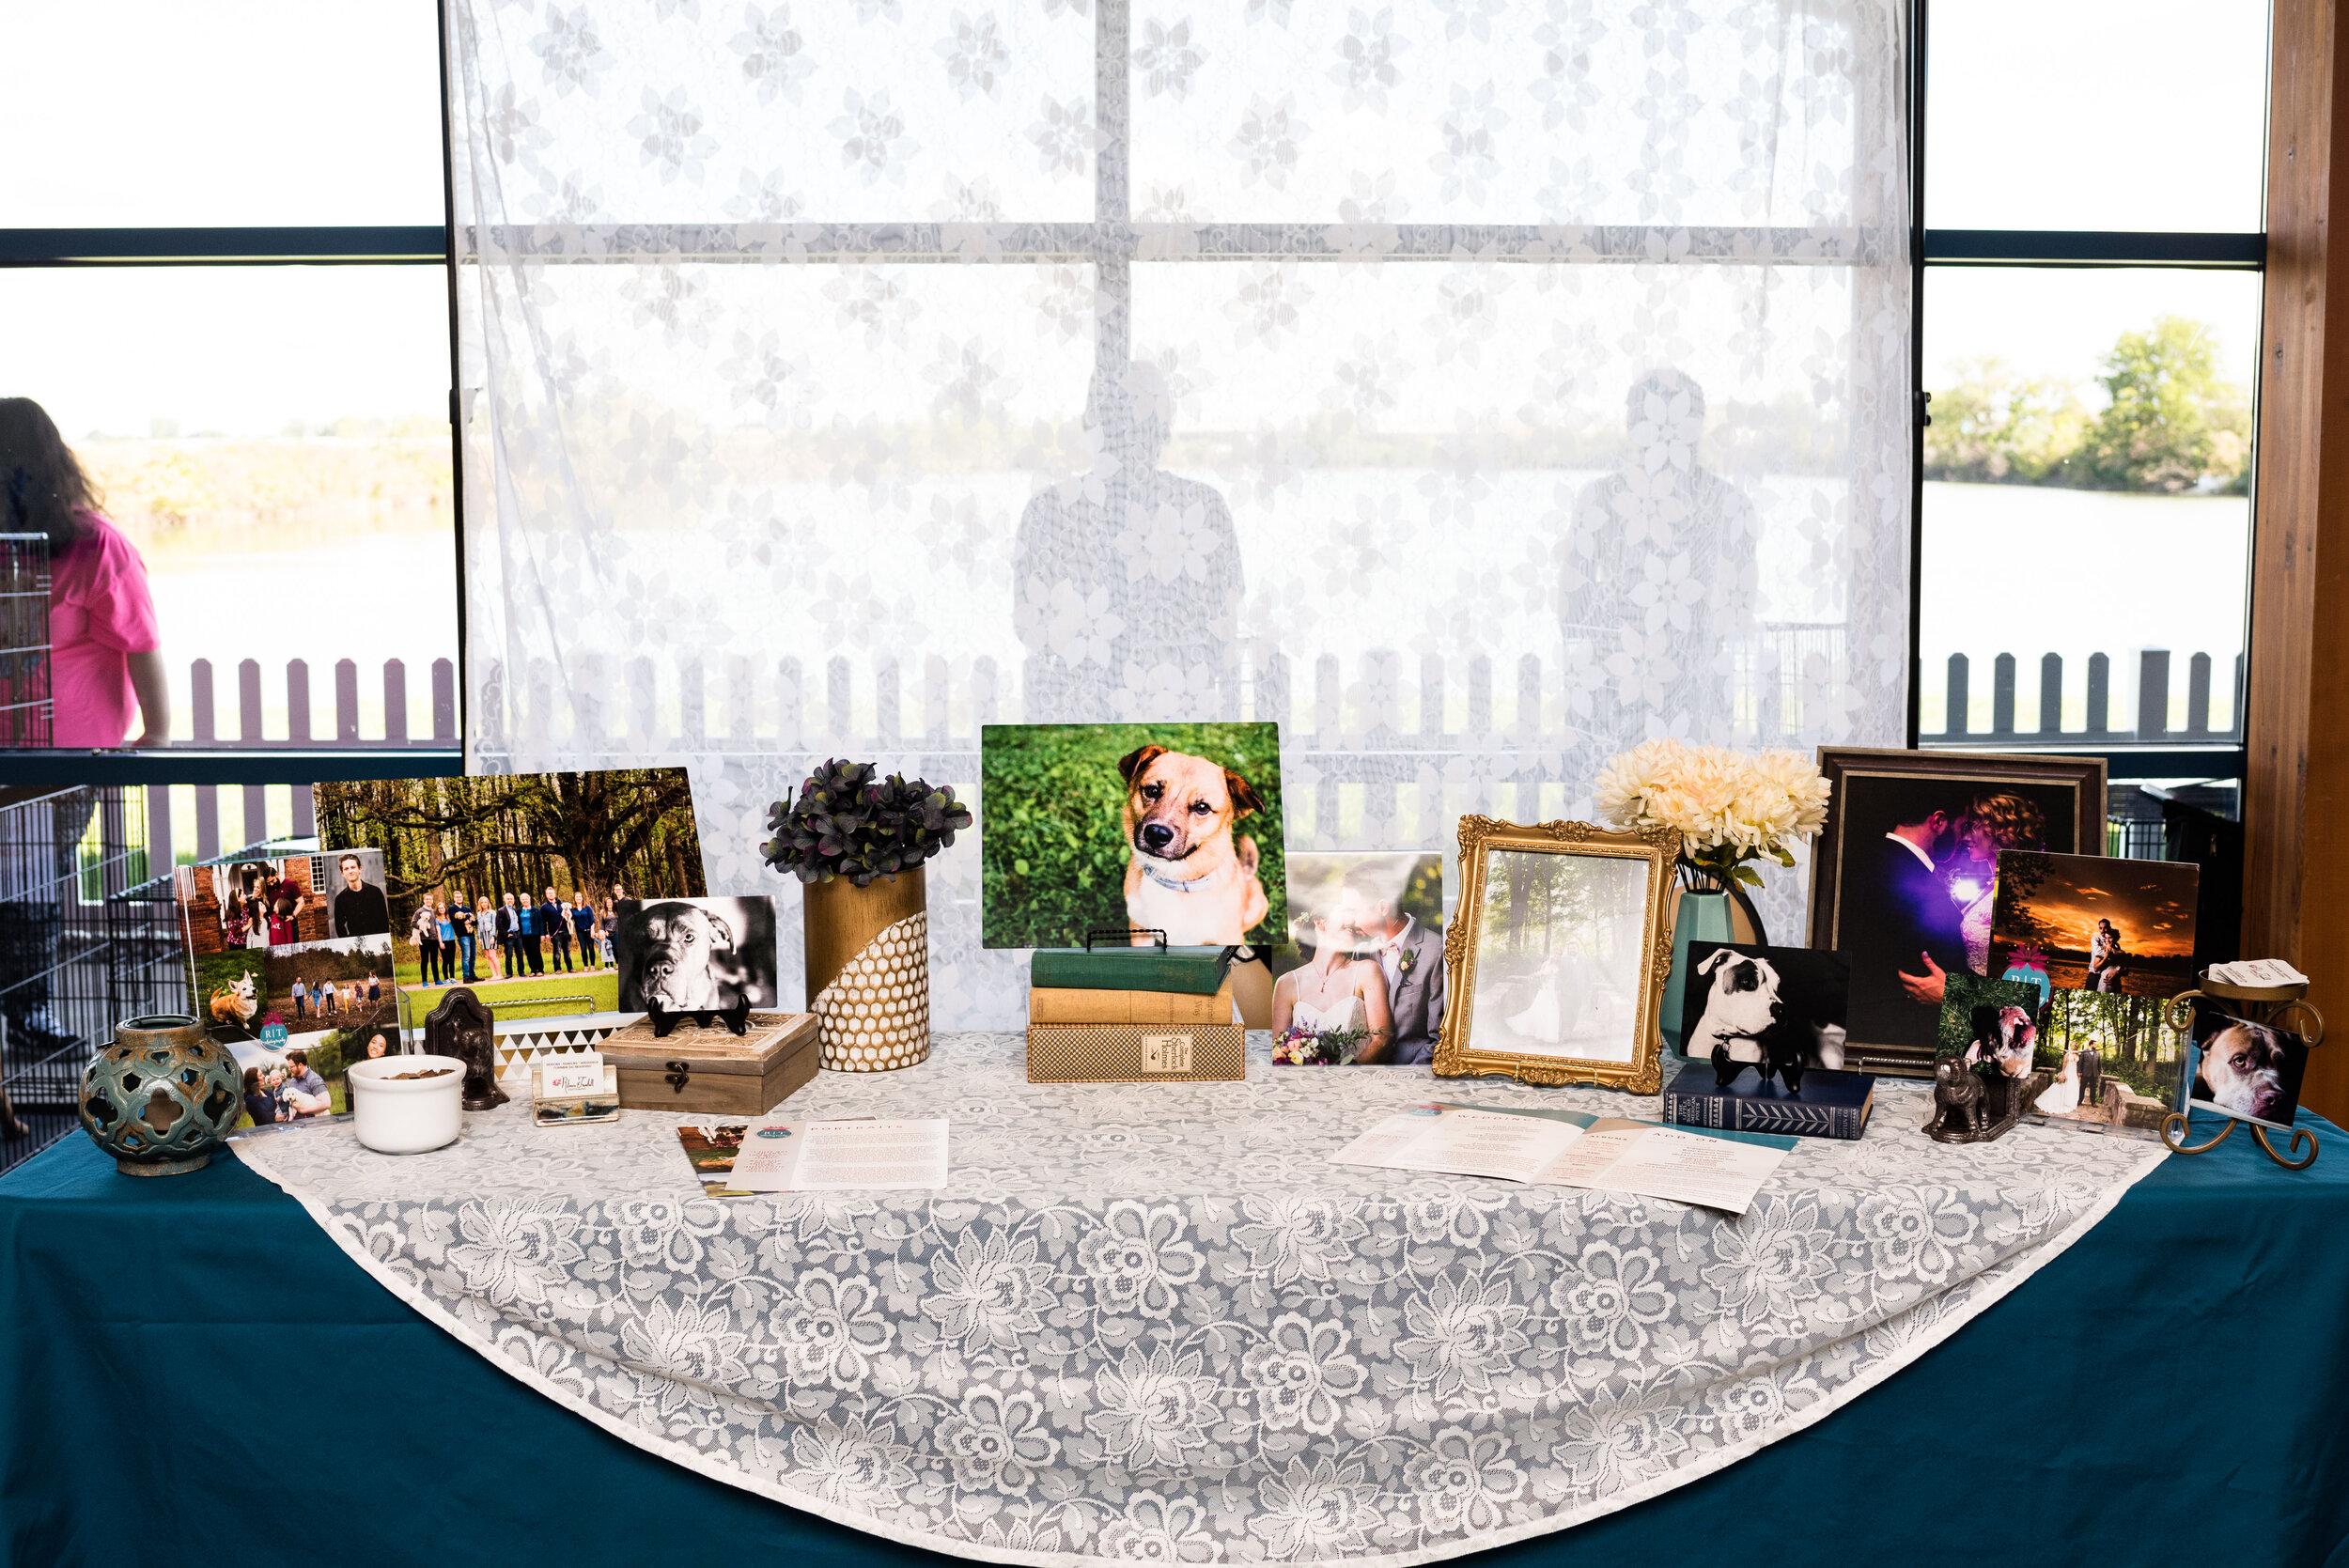 toledo area pet photography pet adoption-1.jpg